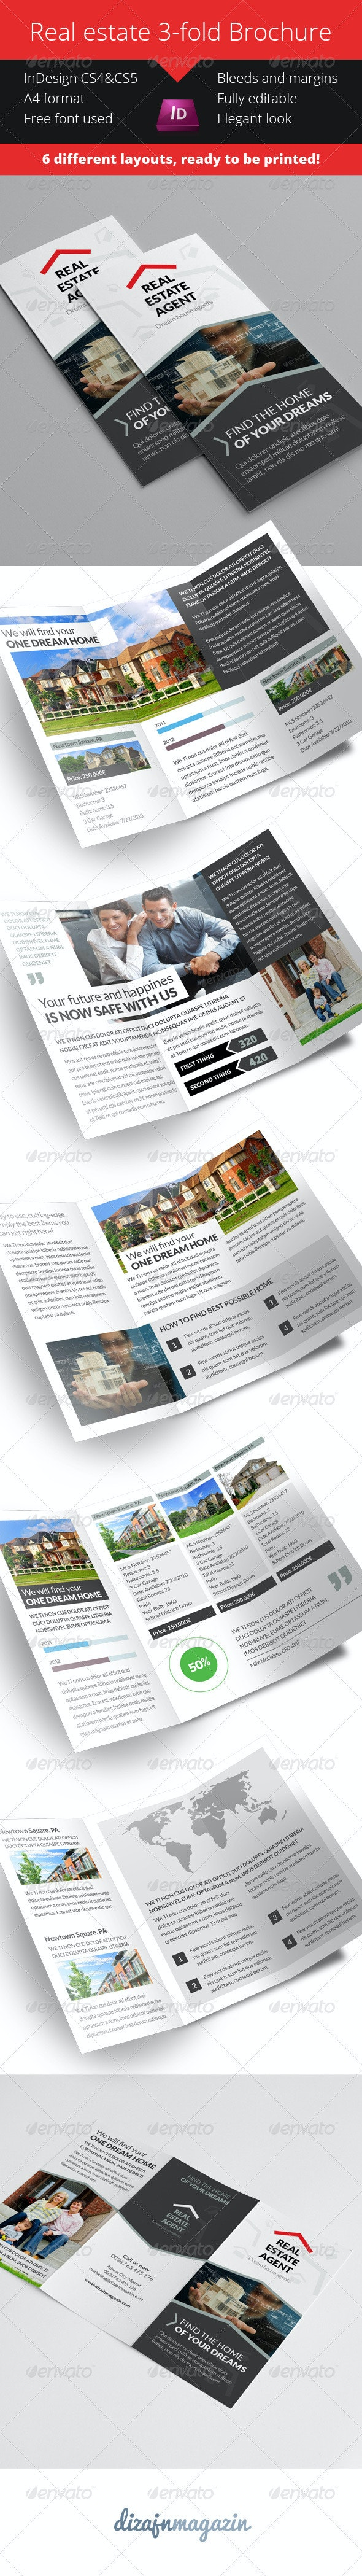 Real Estate 3 Fold Brochure - Product Catalog - Catalogs Brochures